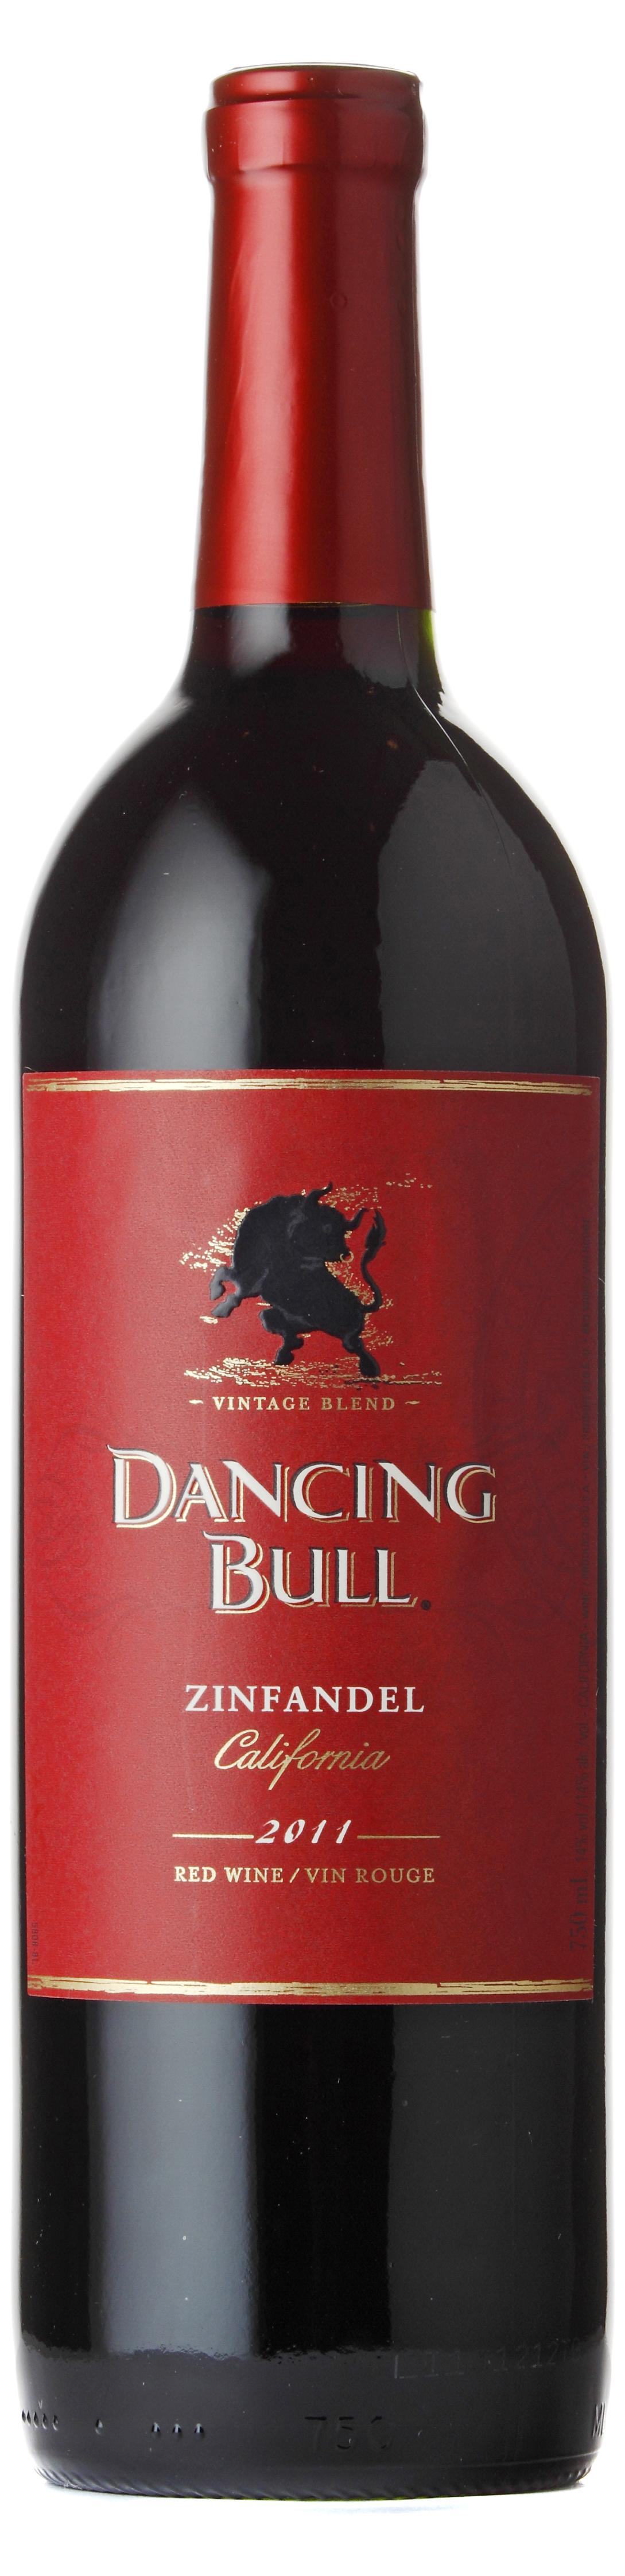 Wine Labels Dancing Bull Zinfandel 2011 Bandw Cred Wine Bottle Red Wine Wine